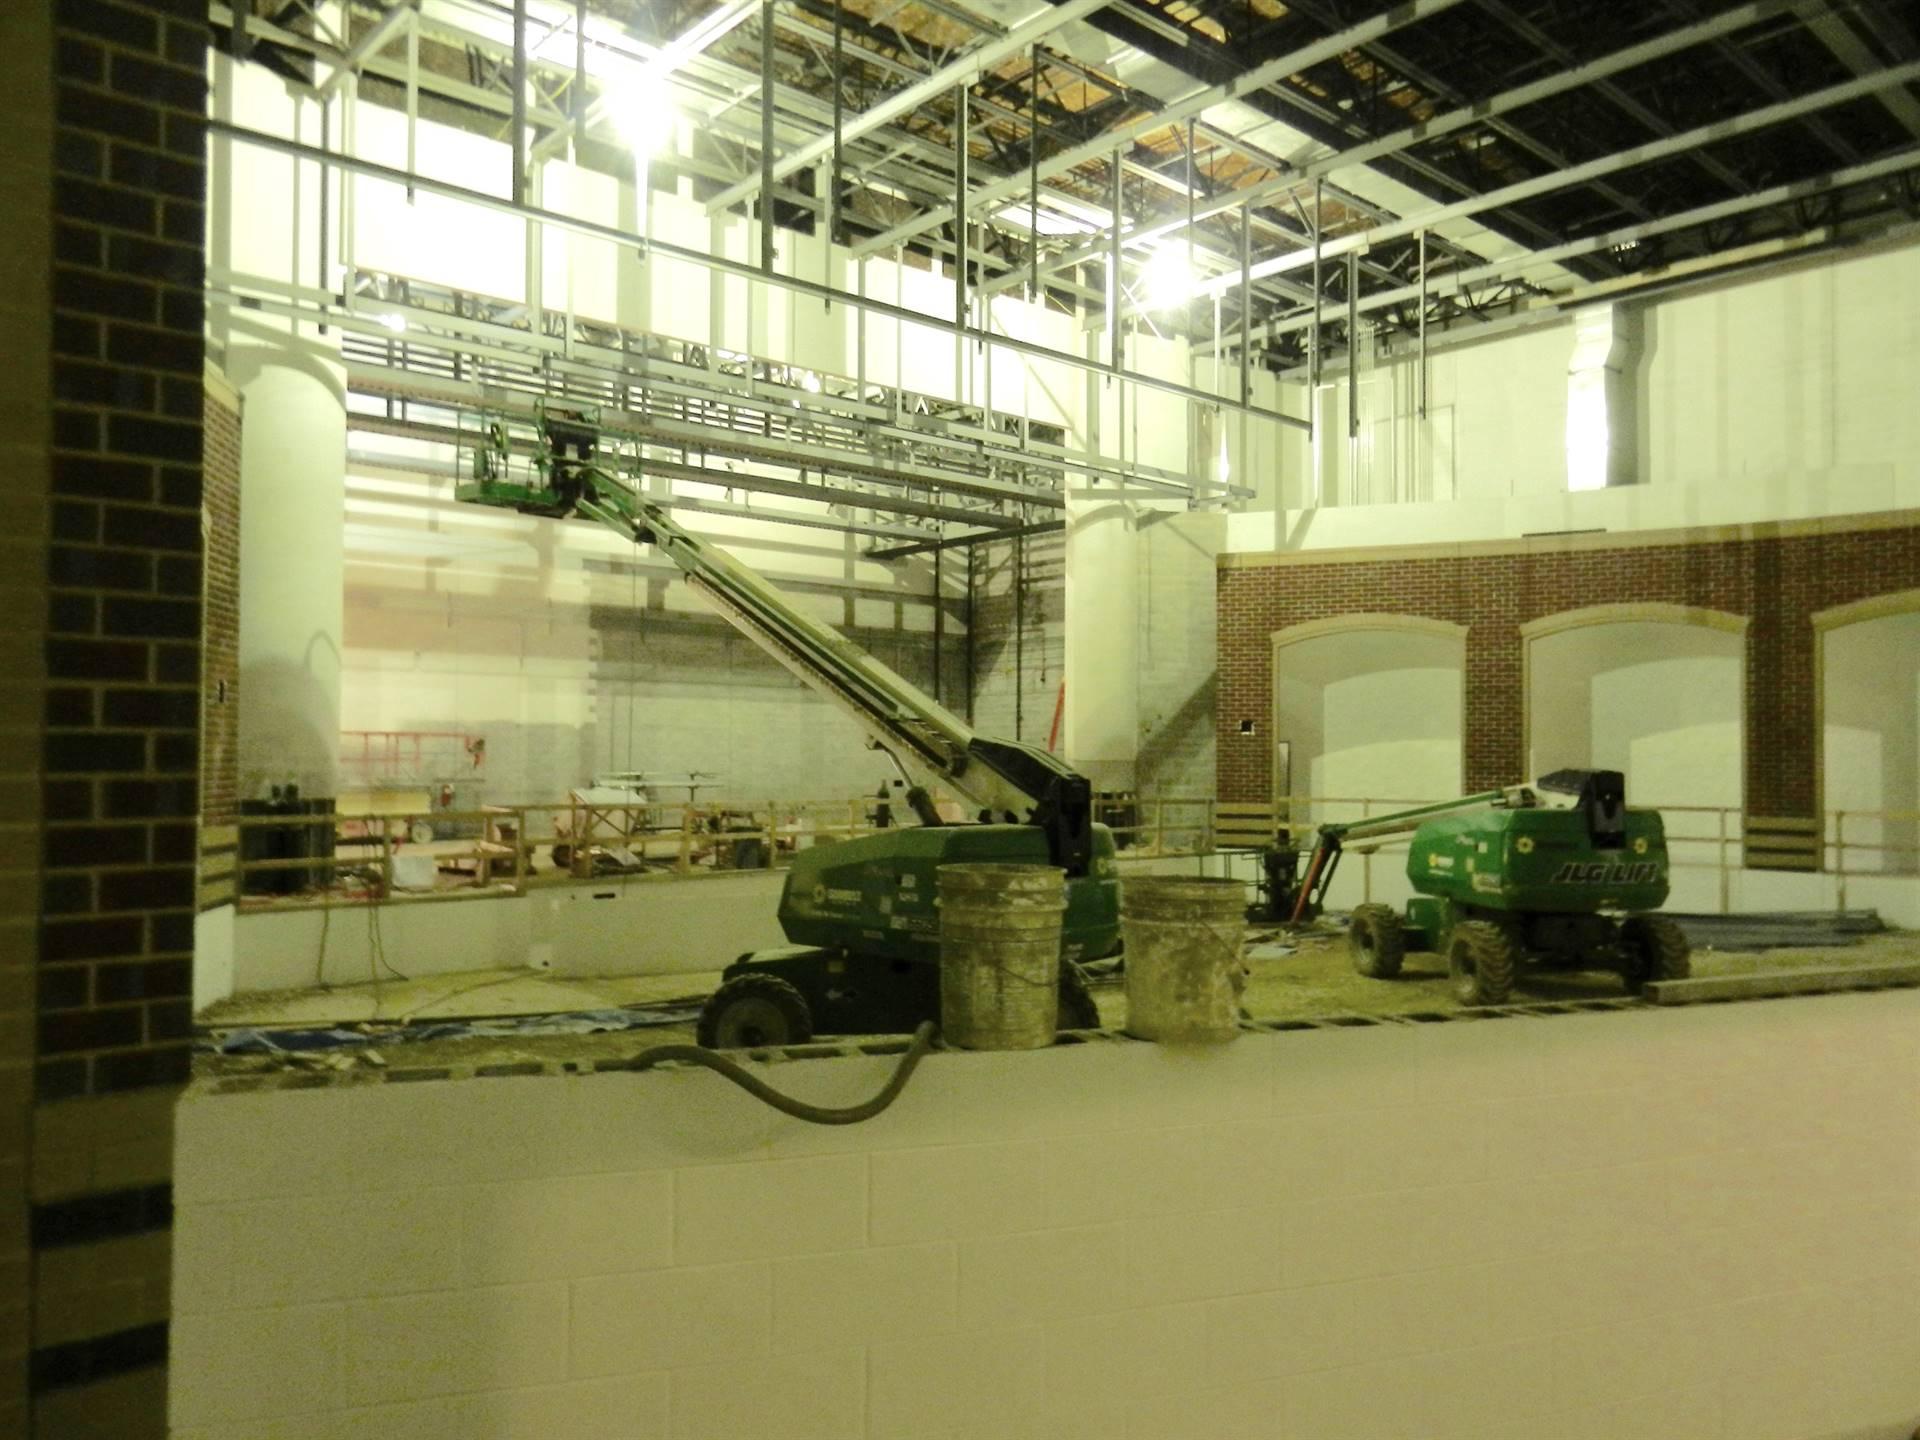 New high school under construction